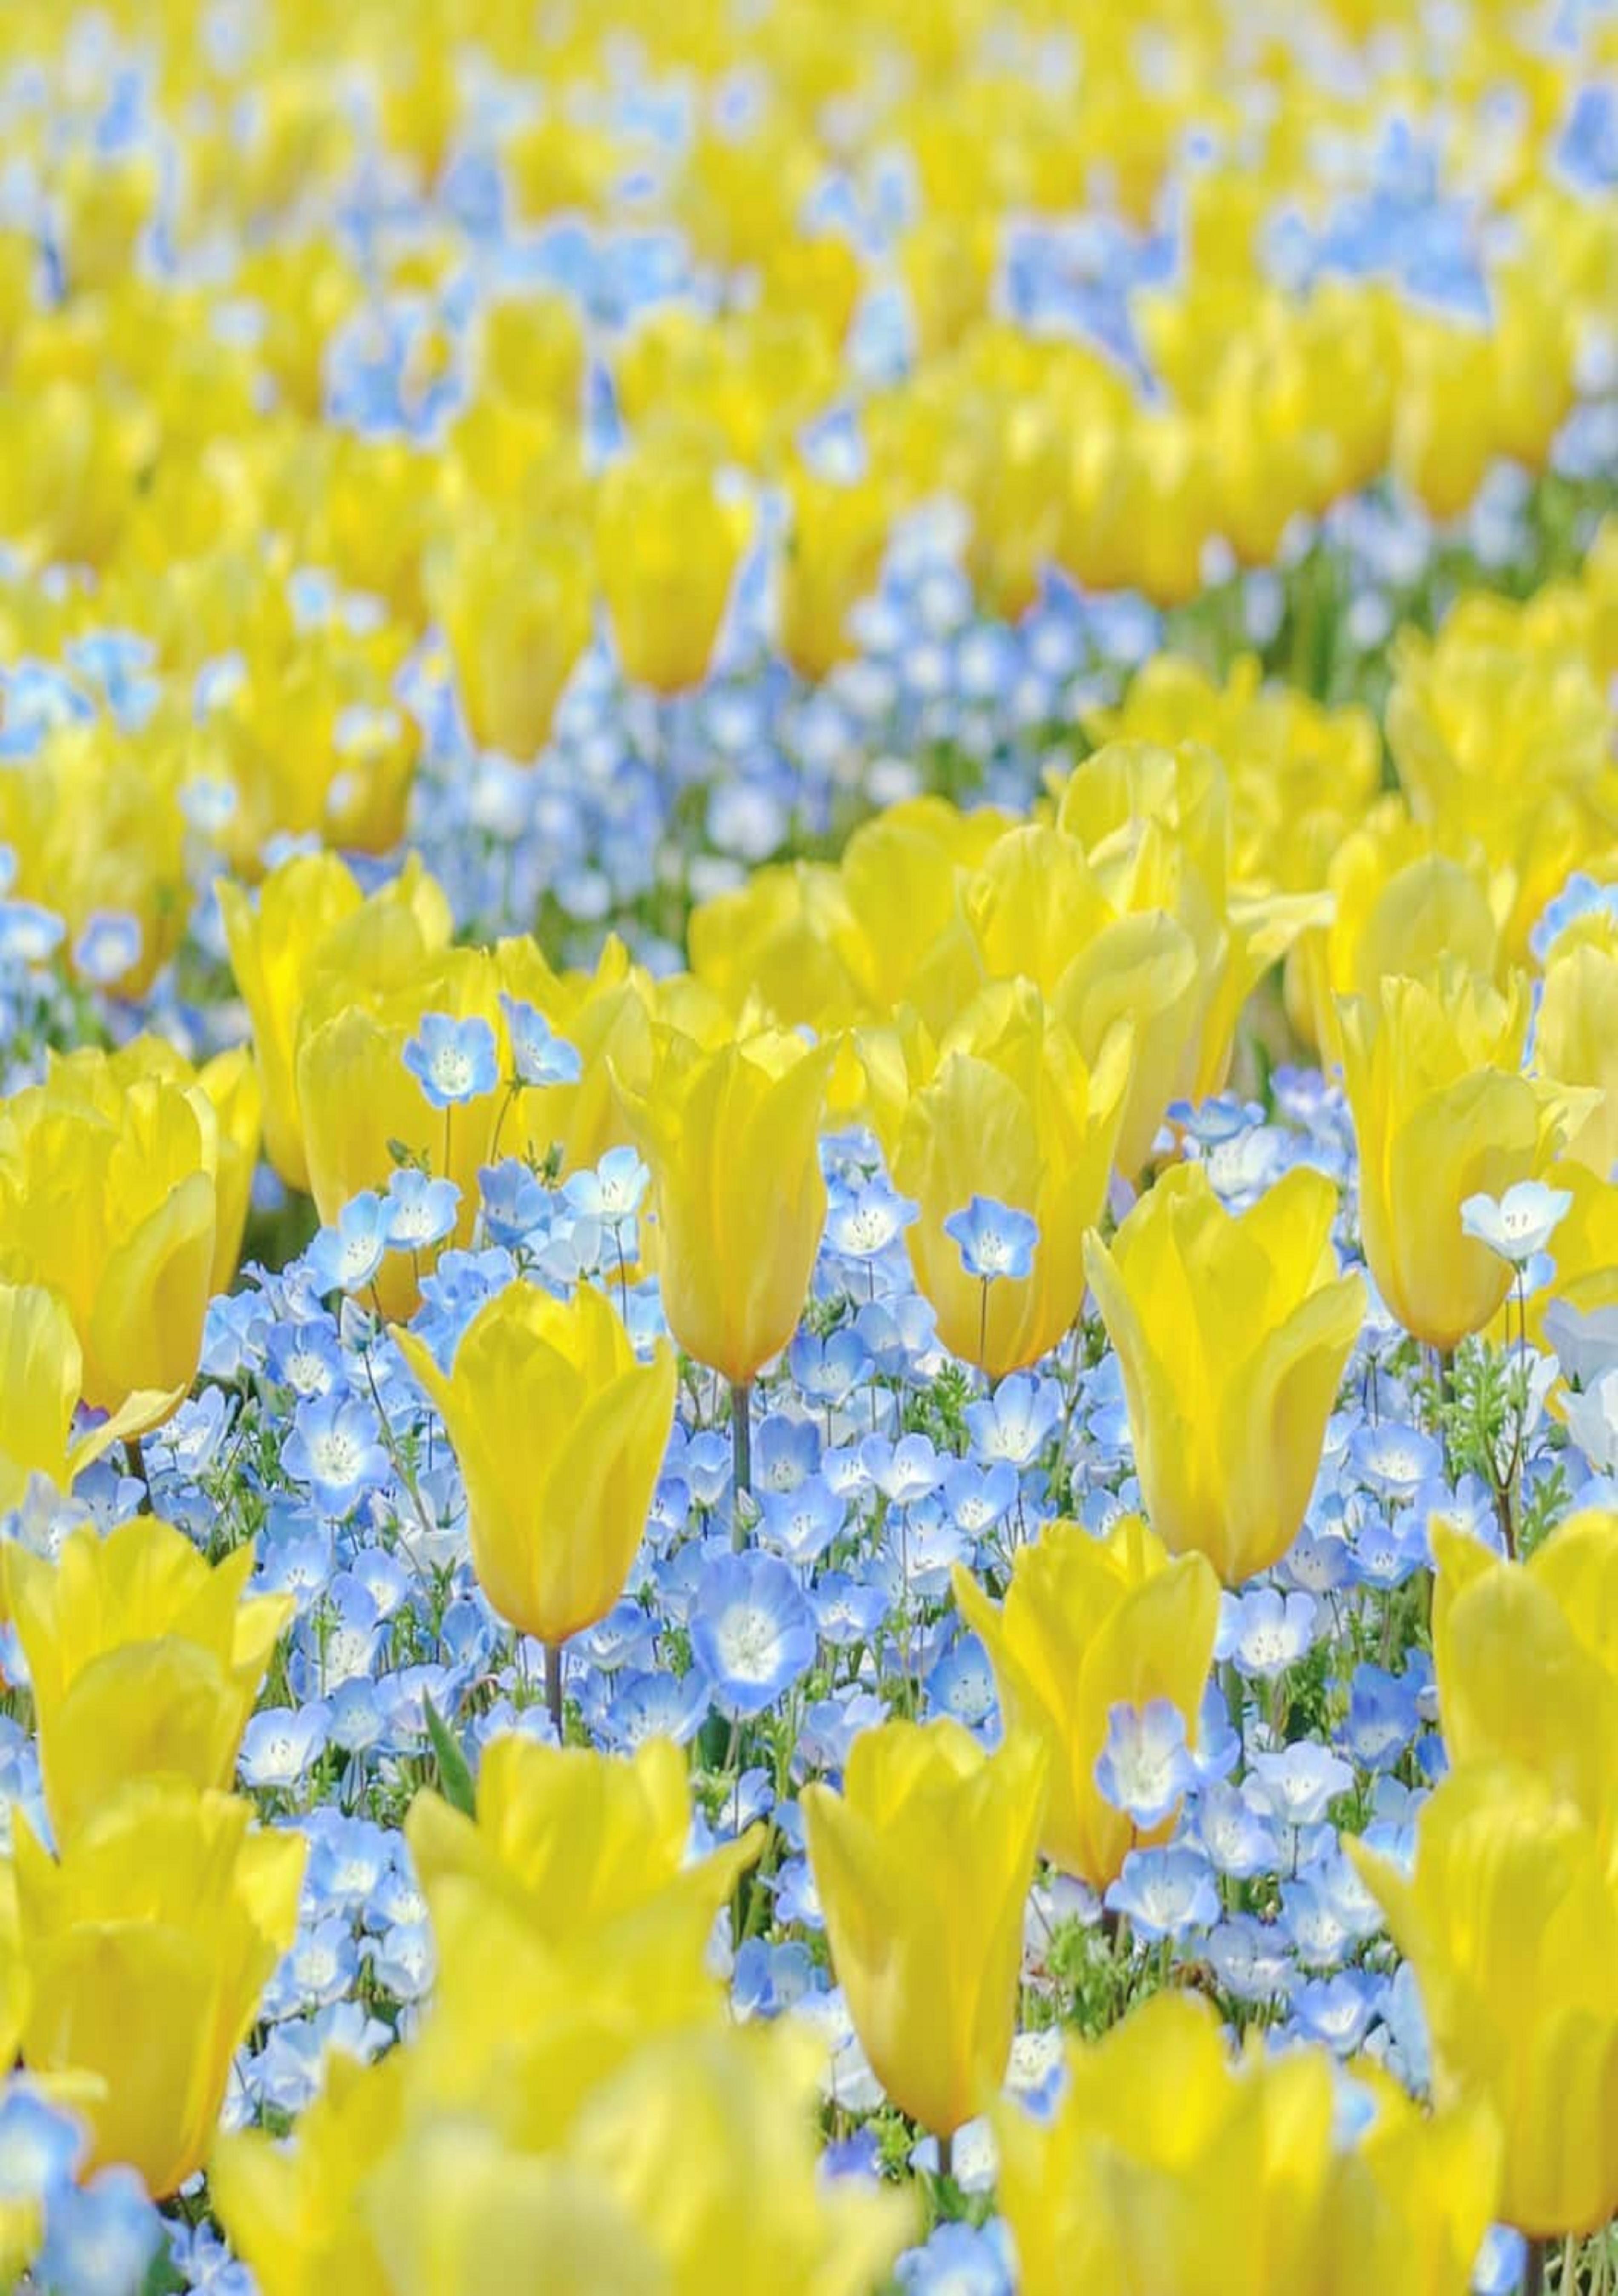 Pin by ivanka kostova on растения Flower field, Flowers